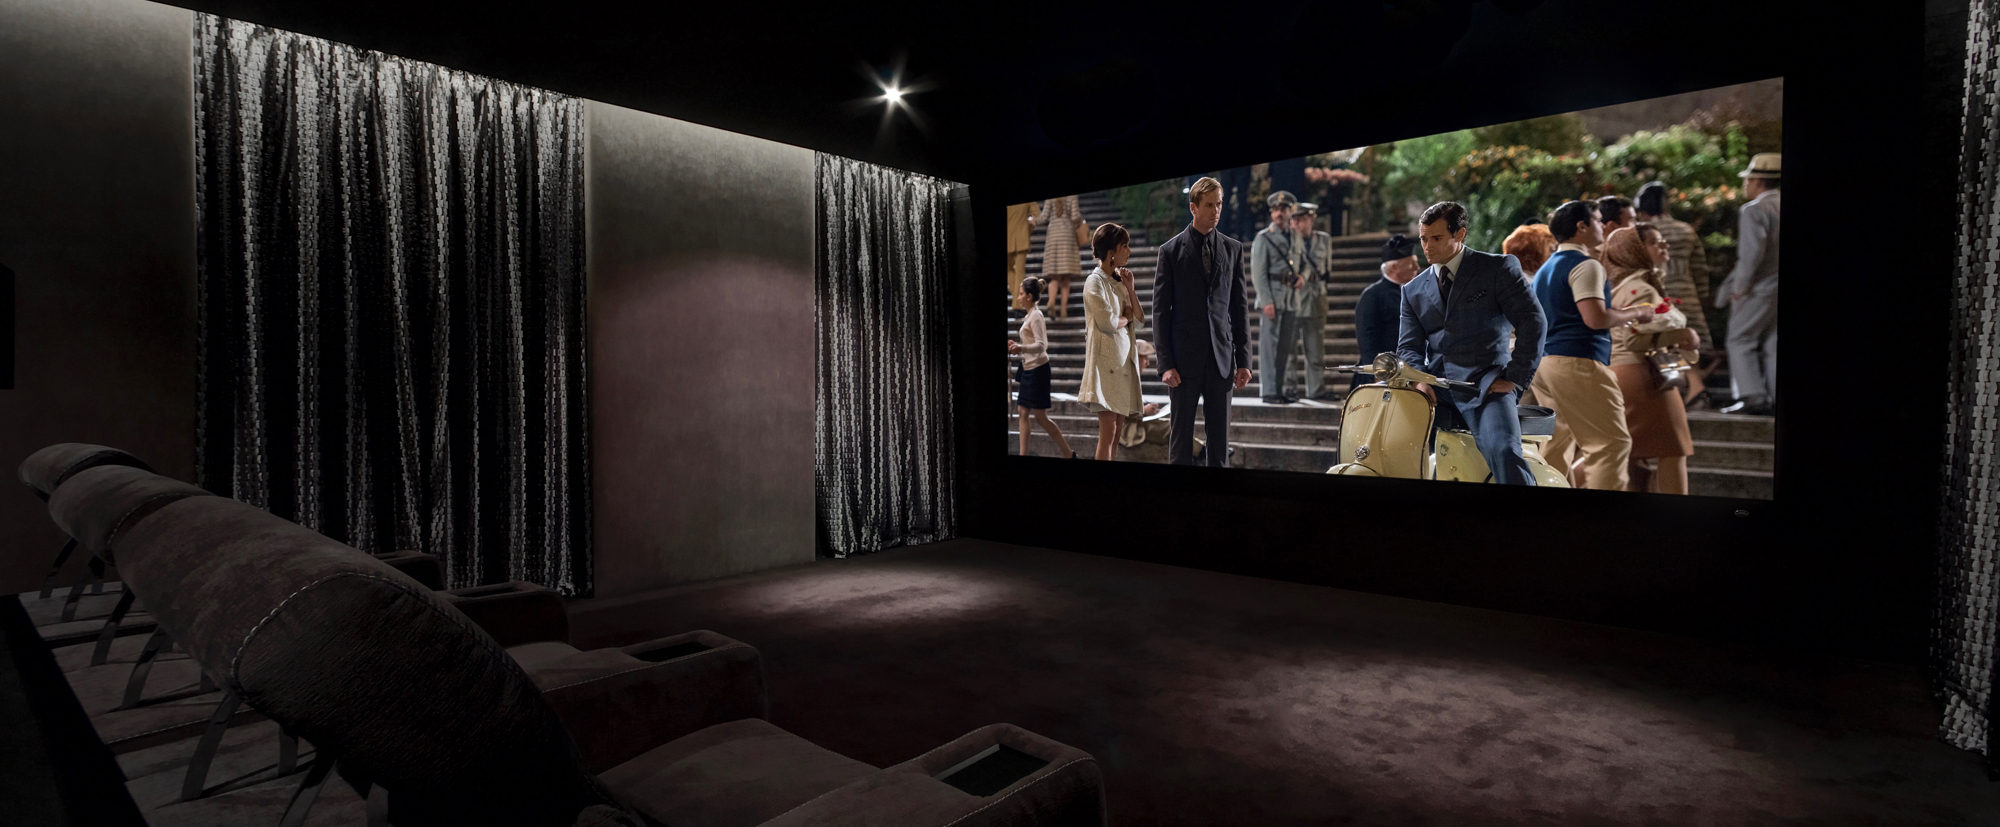 home-cinema-lighting Why 4K UHD Is the Future of Modern Home Cinema Design